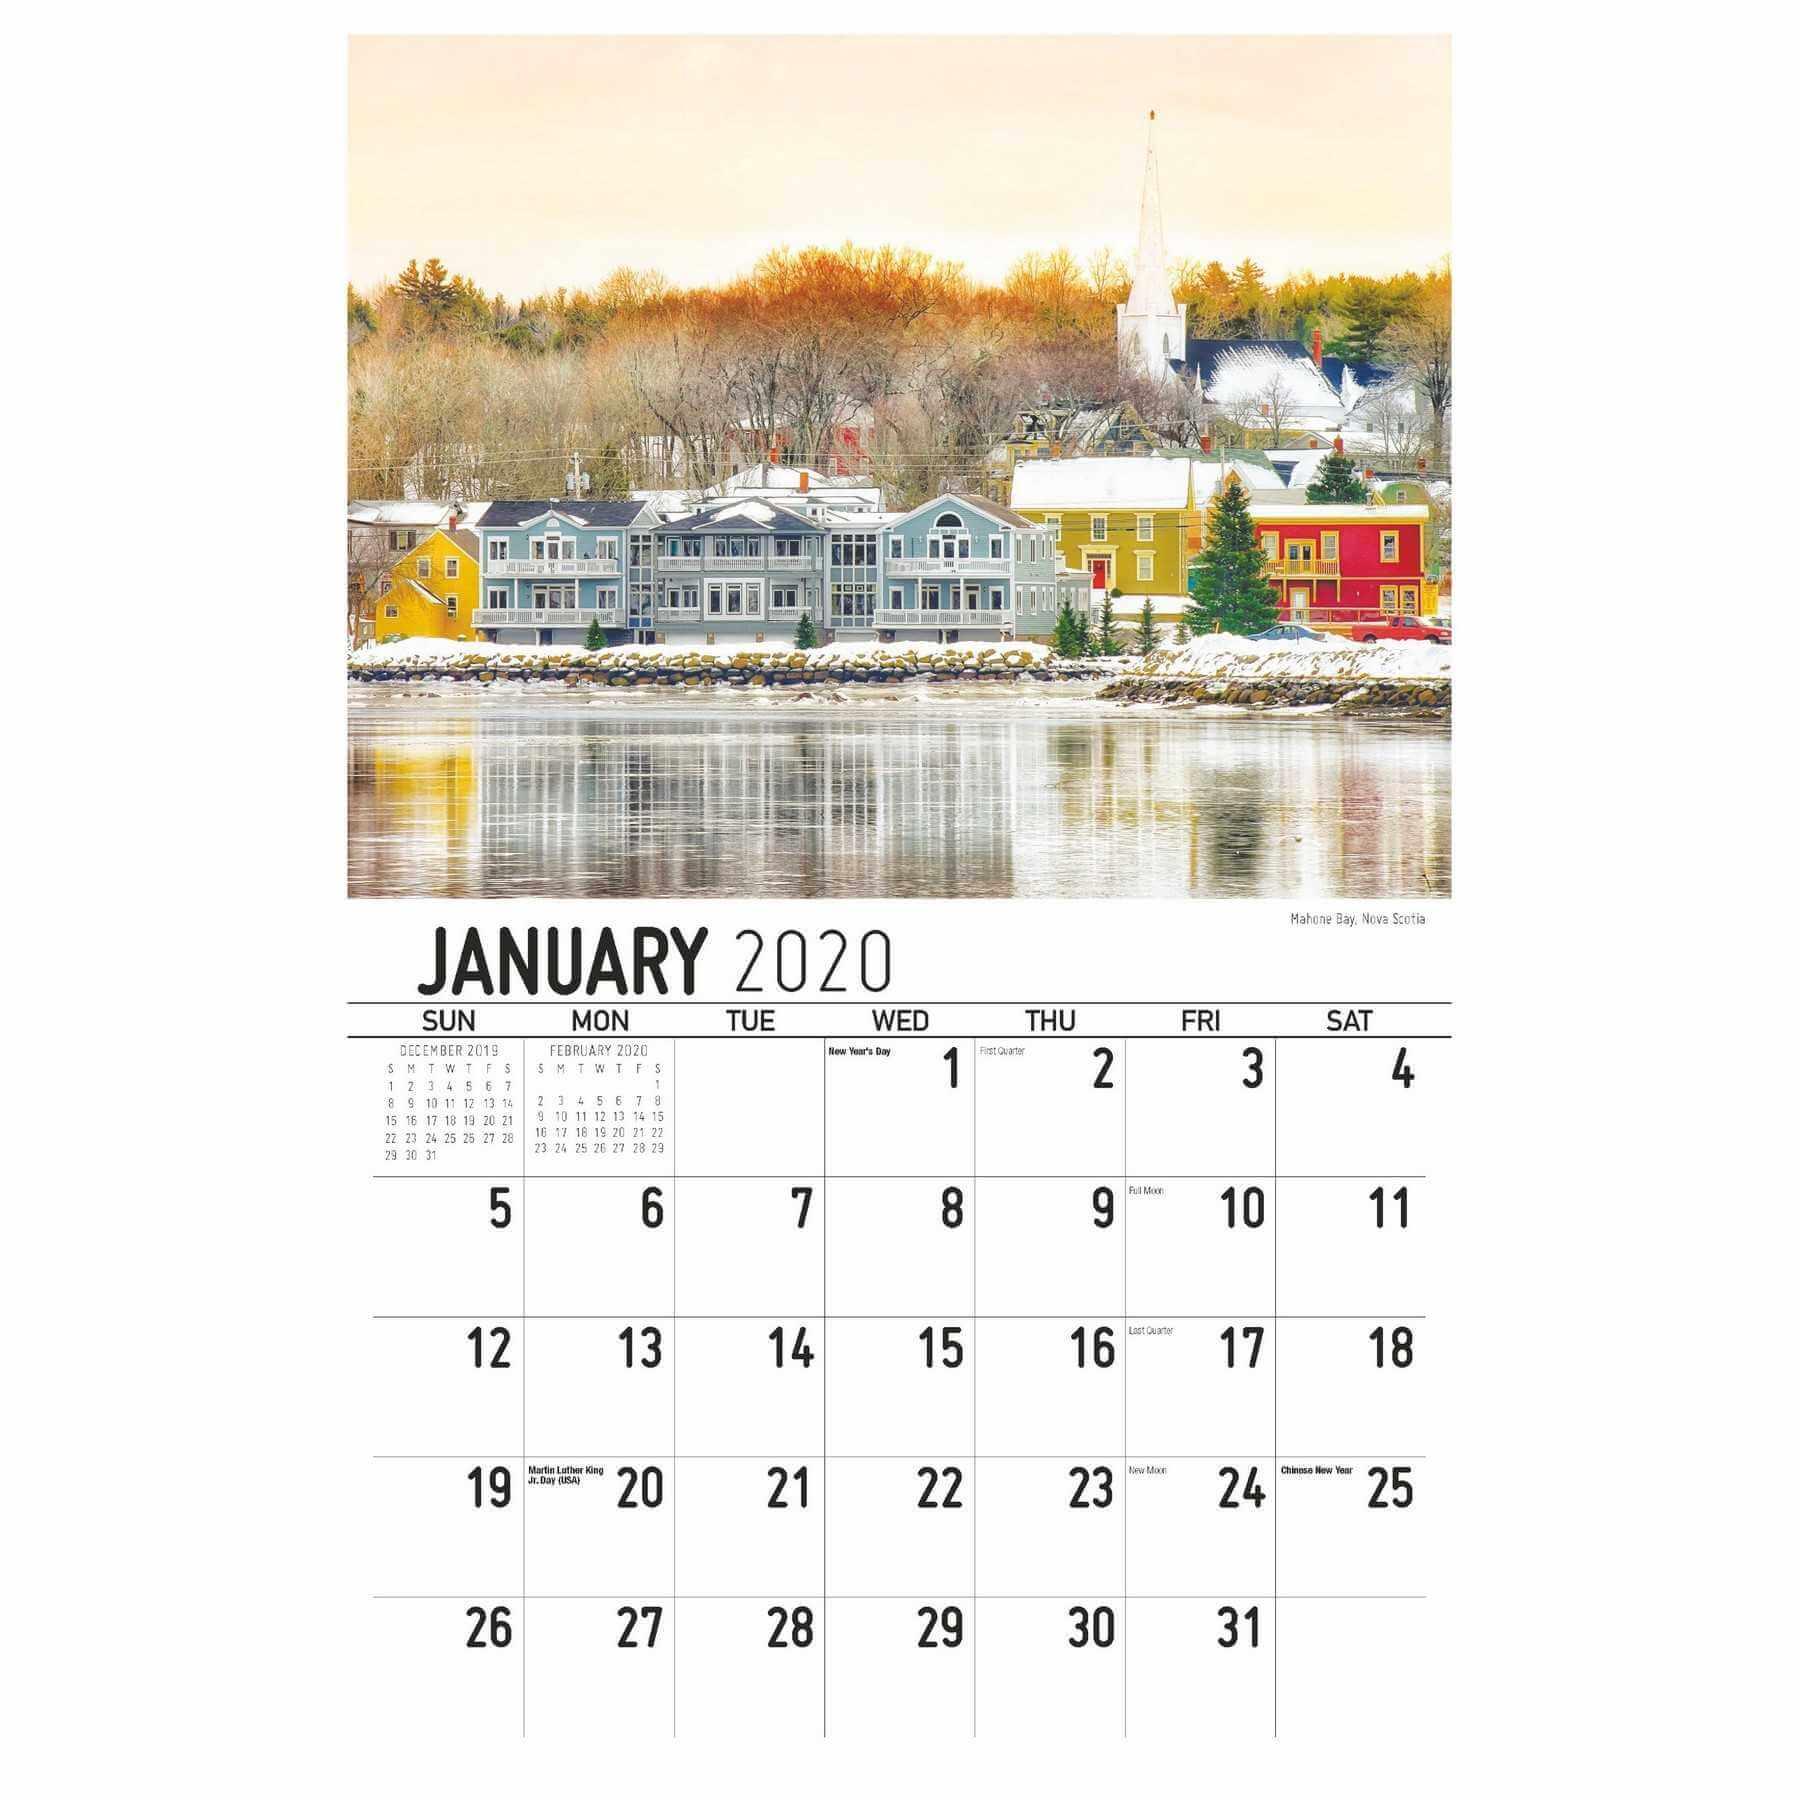 Galleria Wall Calendar 2020 Scenes Of Atlantic Canada within Yrdsb Calendar 2020